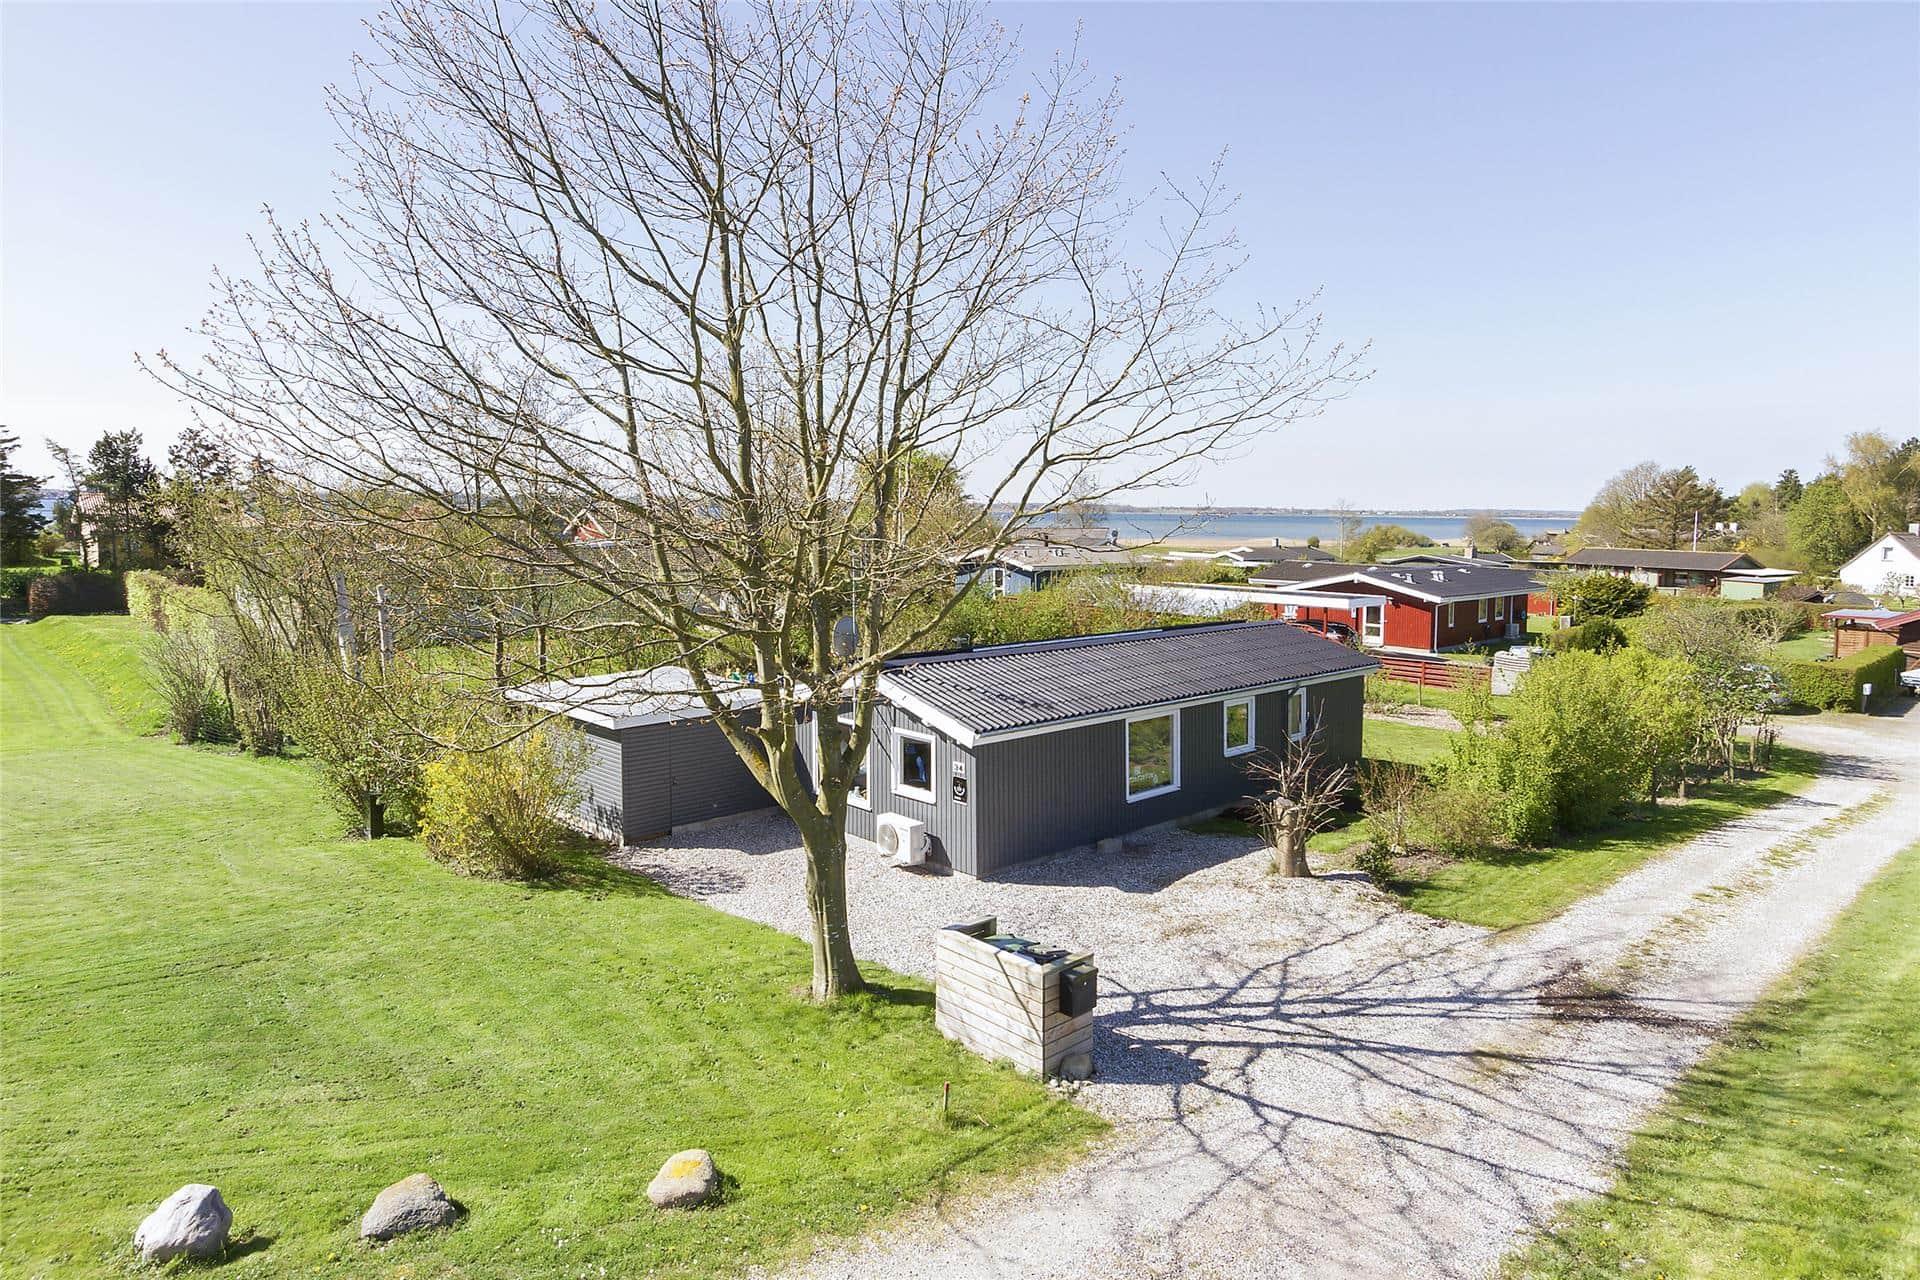 Billede 1-15 Sommerhus 7301, A. Johnsonsvej 34, DK - 4793 Bogø By